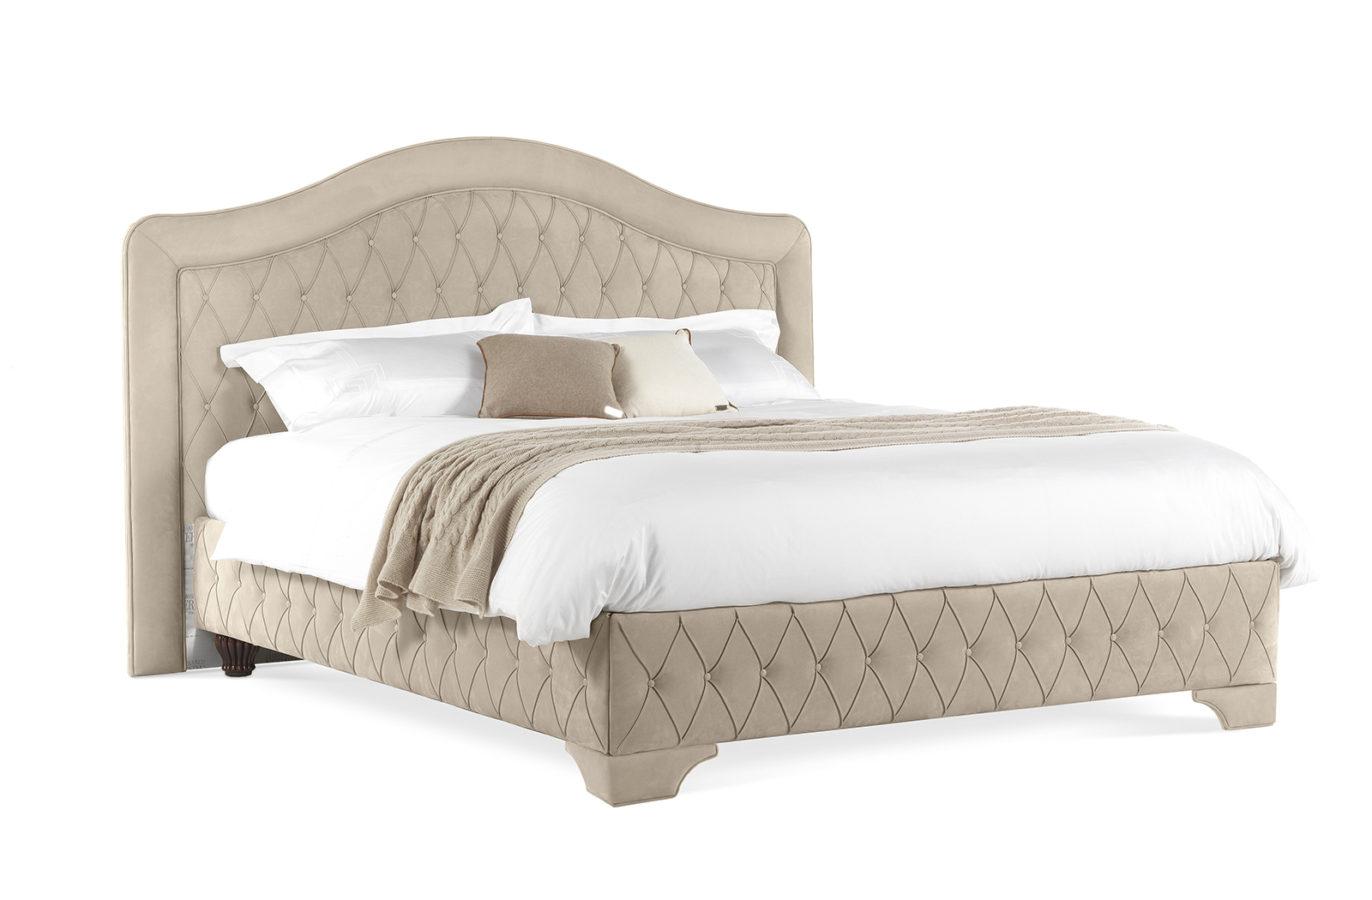 Gianfranco Ferre Home Kimberley Bed 01